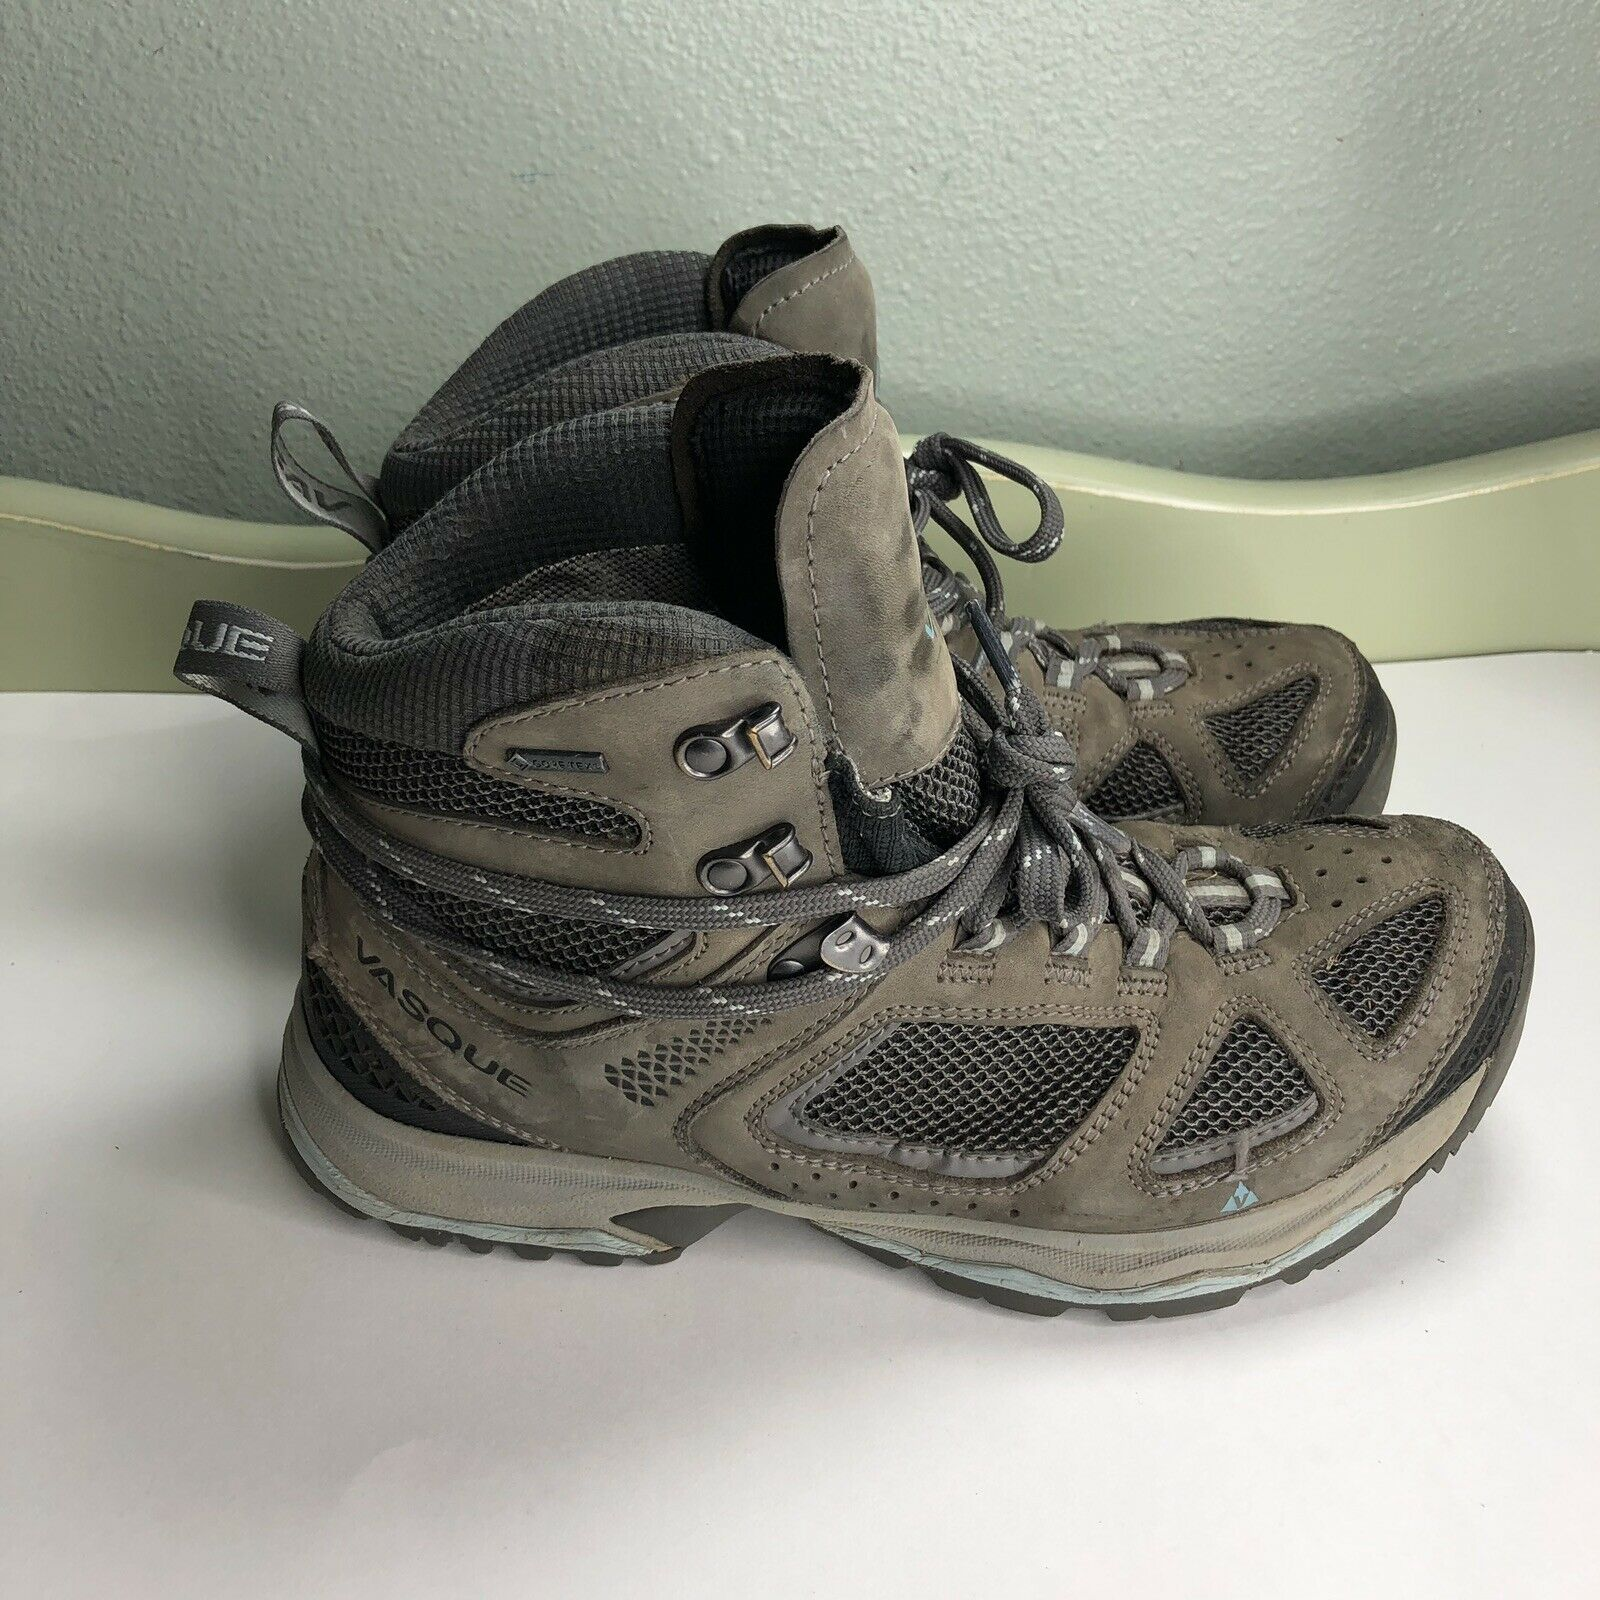 Vasque Hiking  Boots Women Size 9.5 Gore Tex Vibram Soles  fishional store for sale